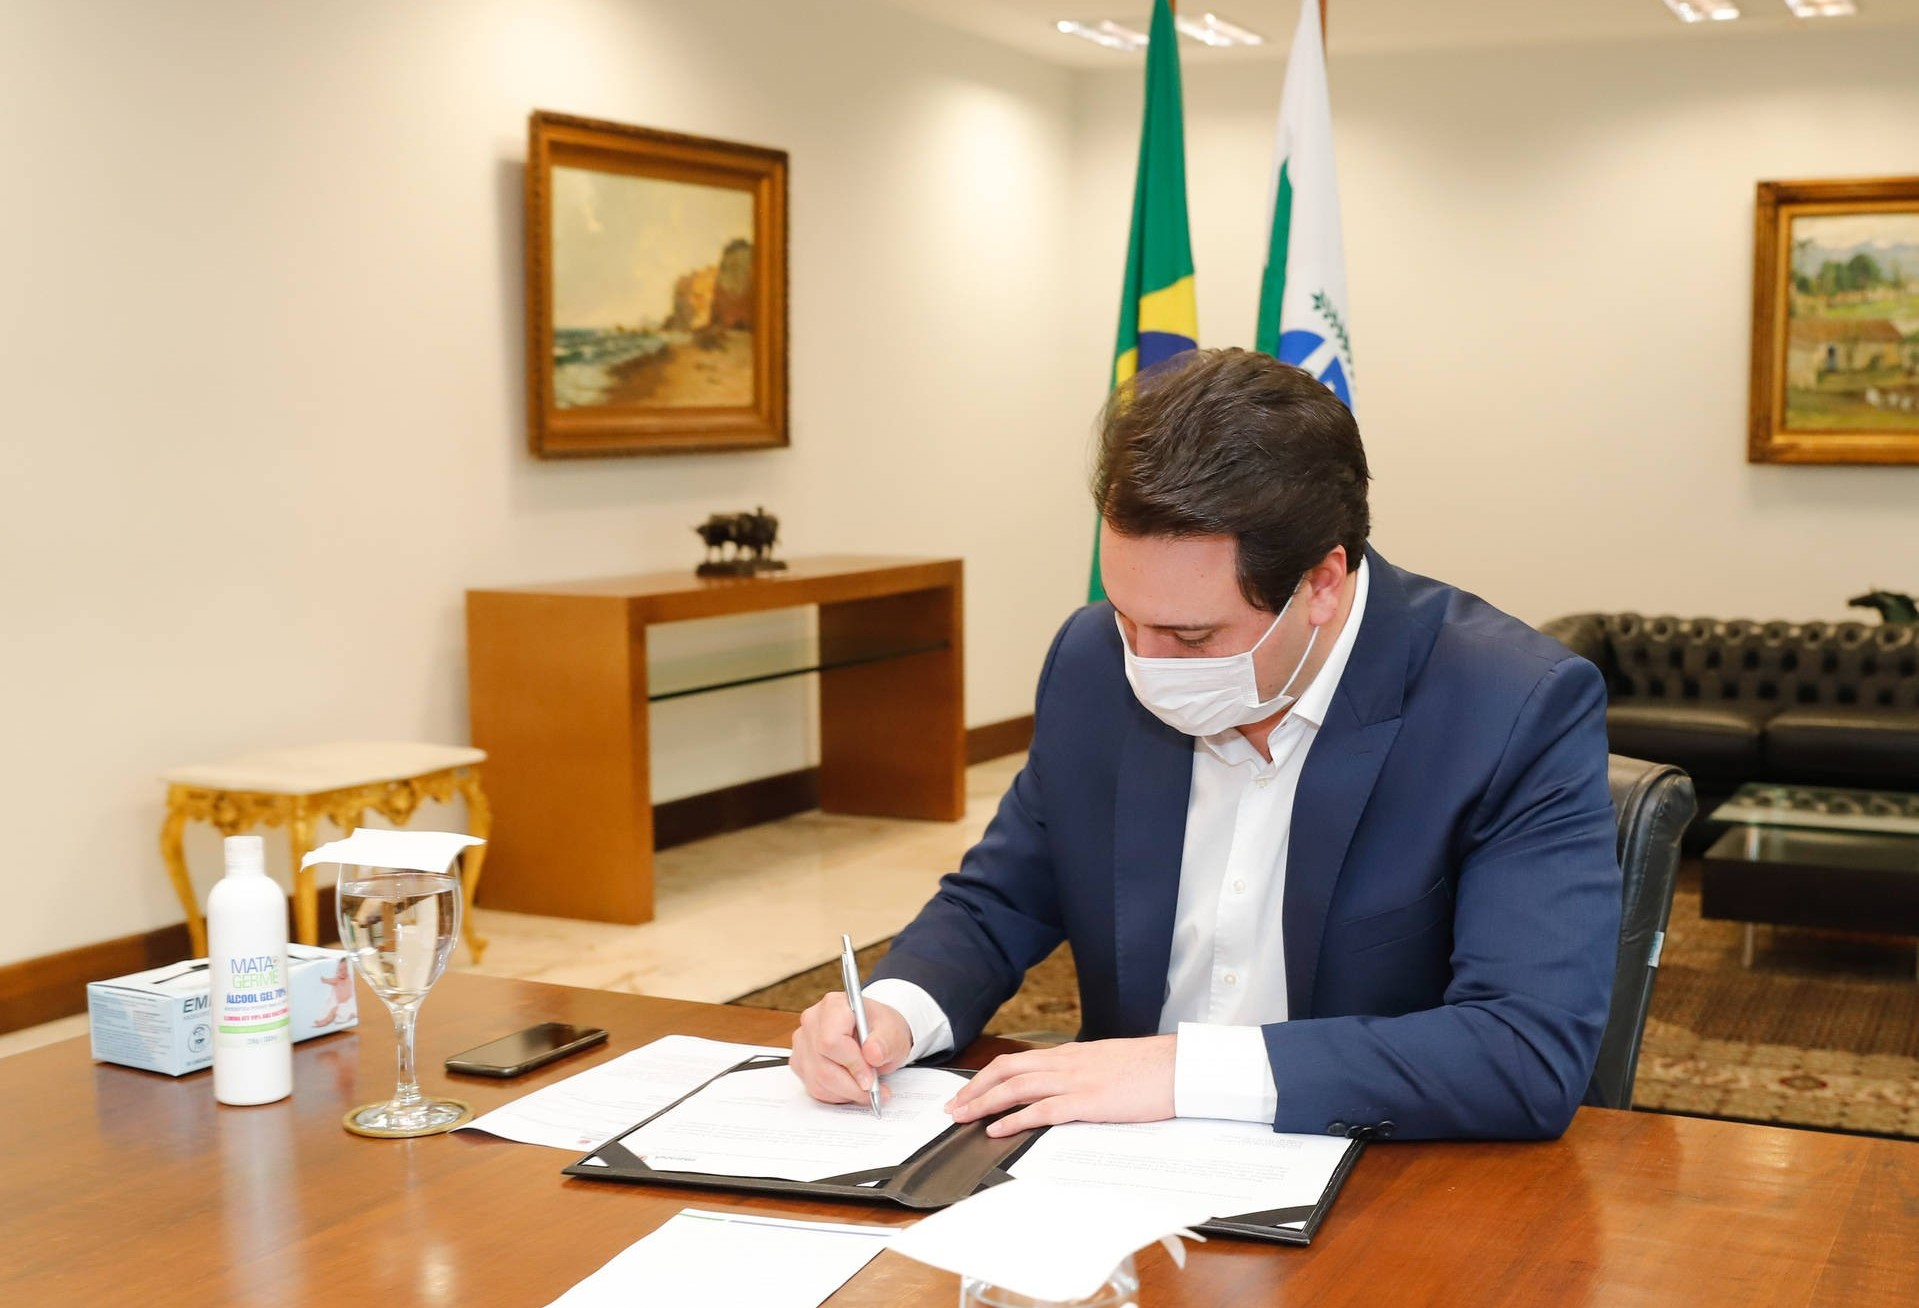 Governo propõe R$ 100 milhões para compra de vacina contra o coronavírus